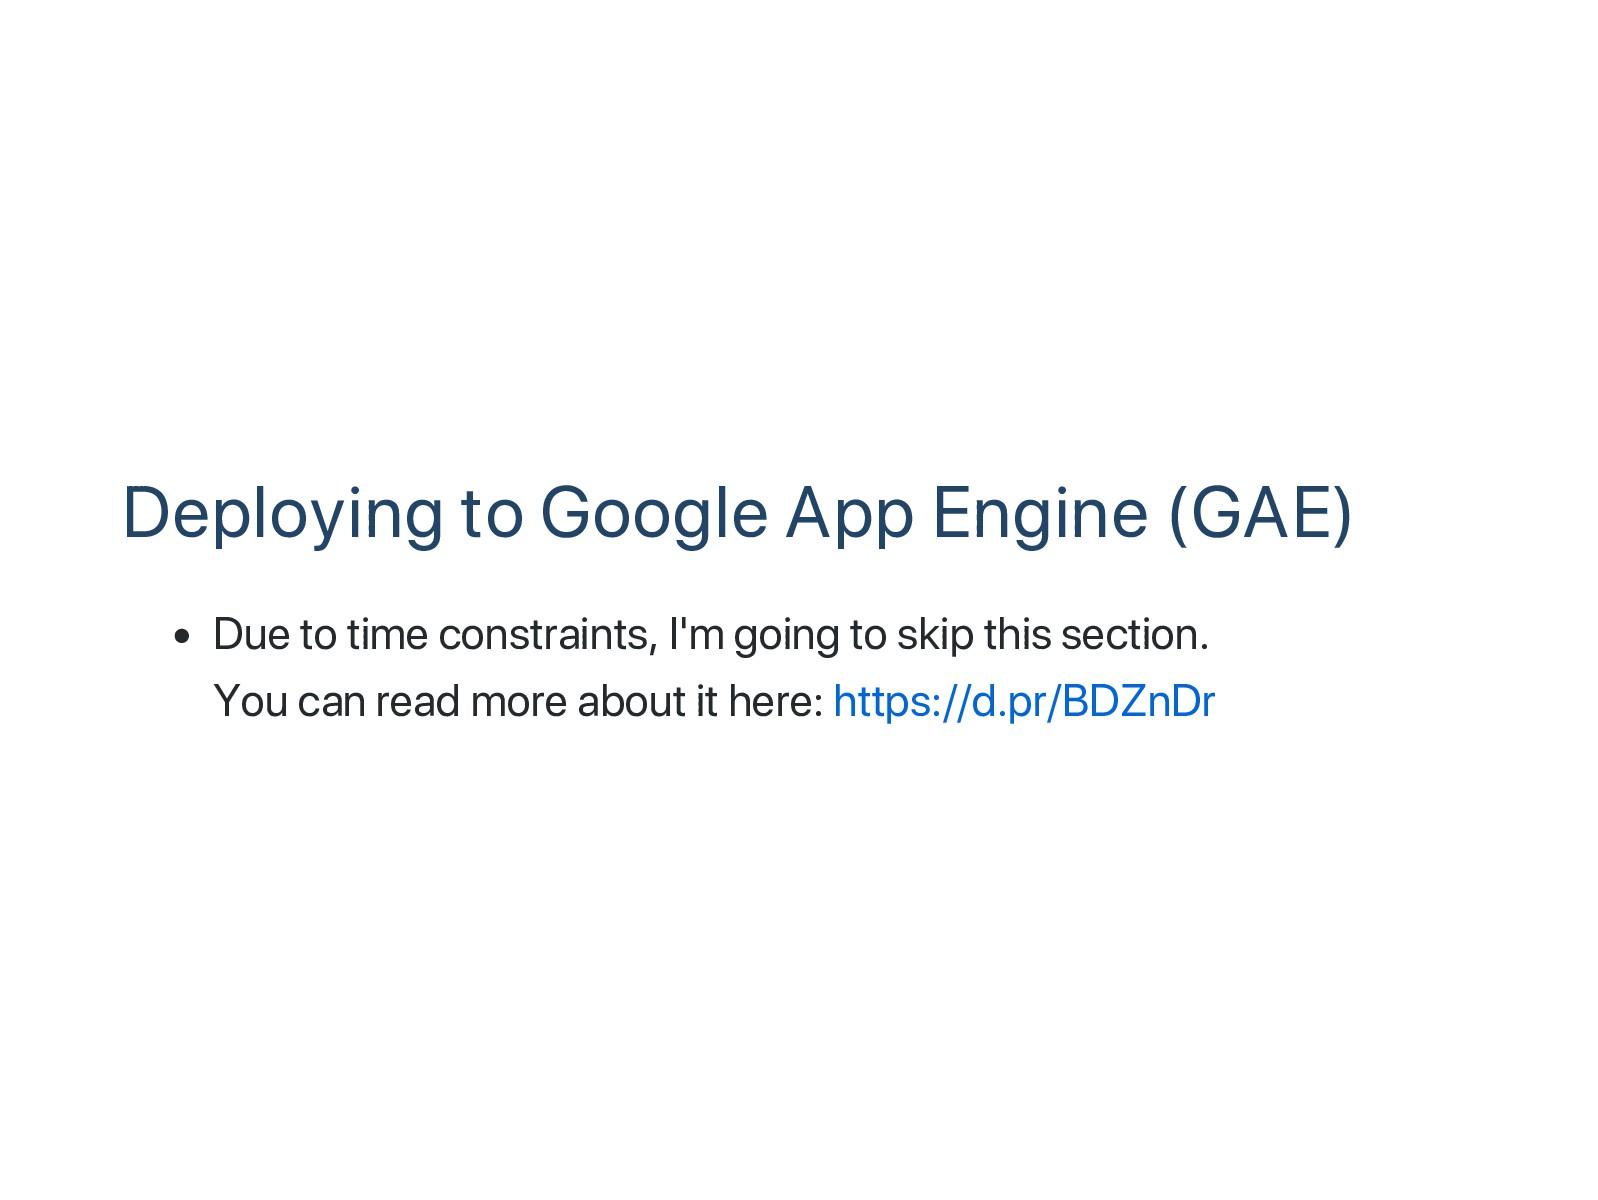 Deploying to Google App Engine (GAE) Due to tim...